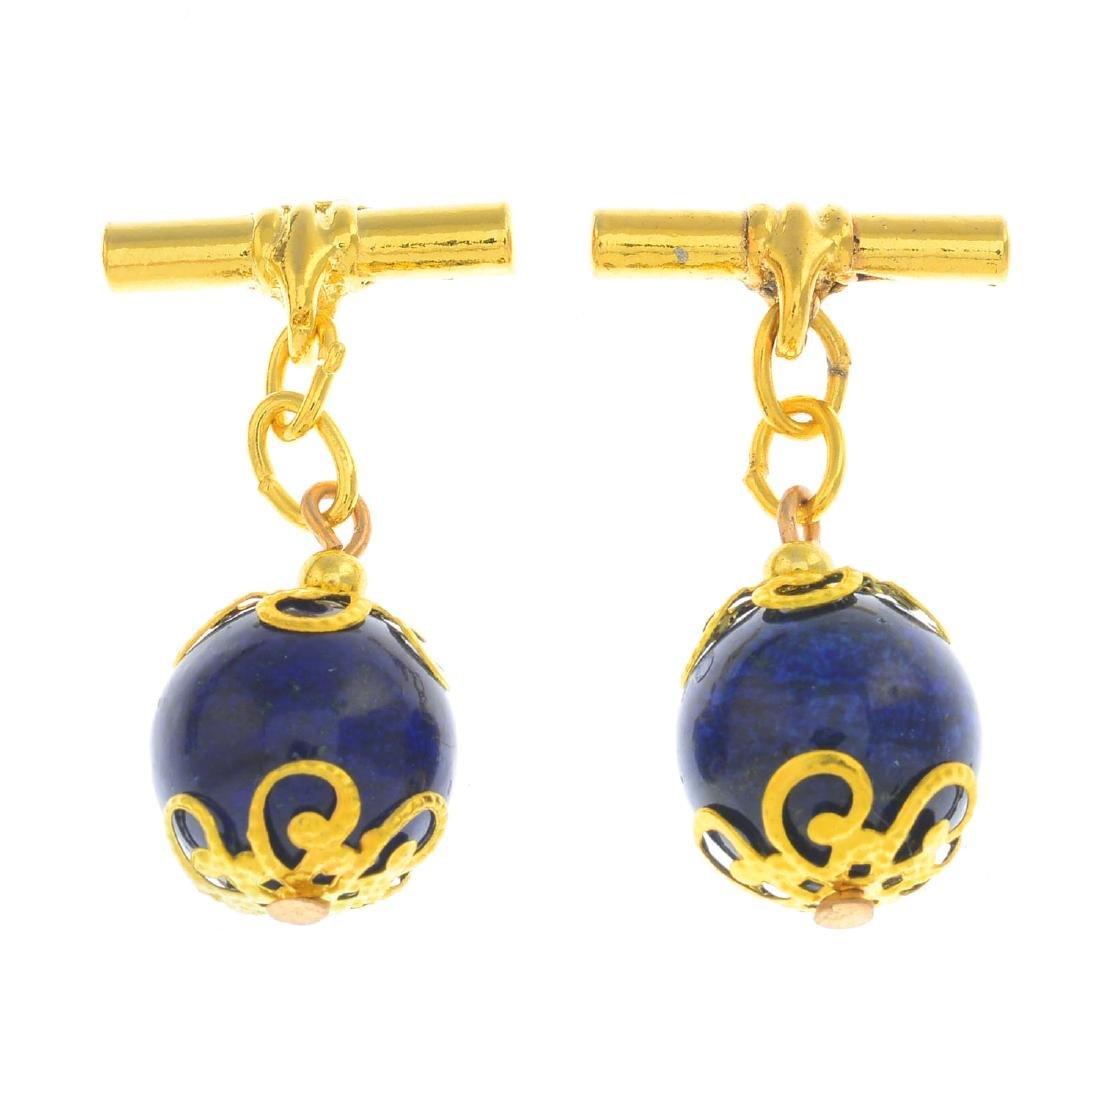 A pair of lapis lazuli cufflinks. Each designed as a